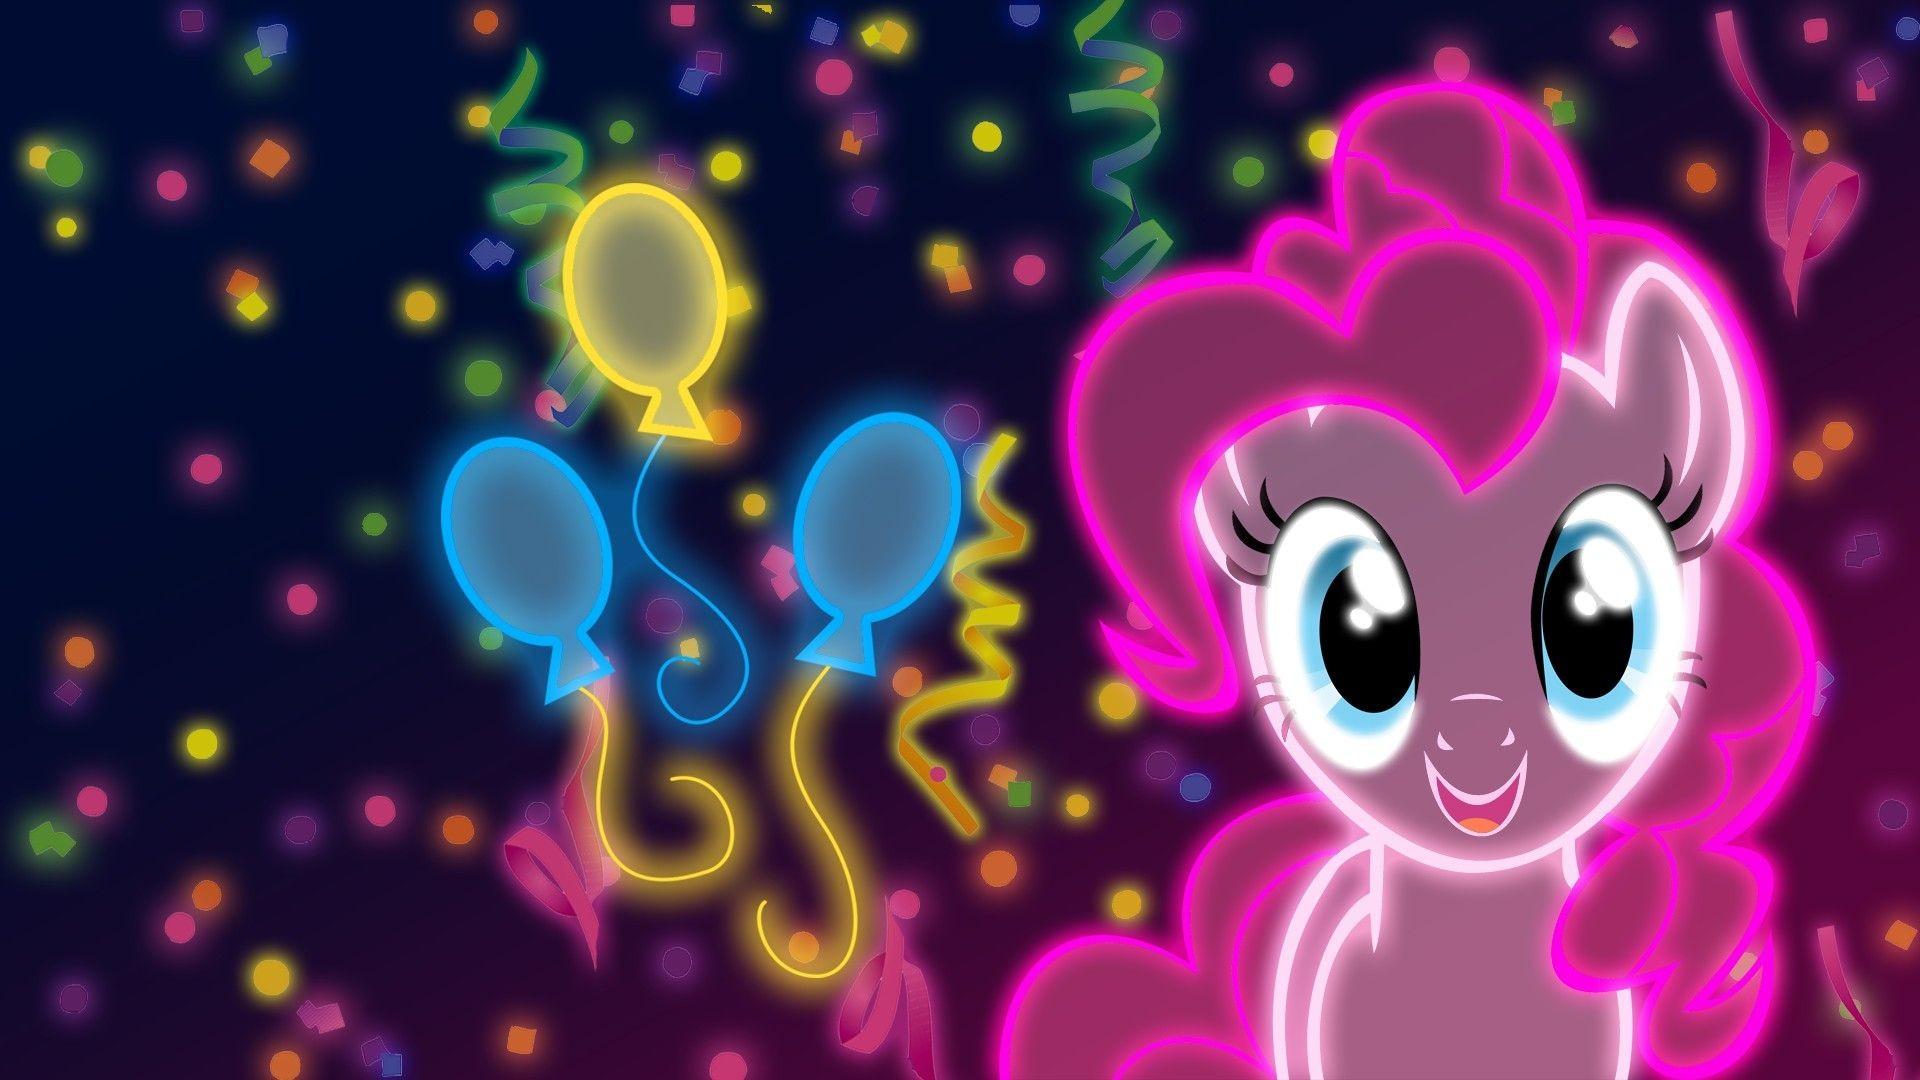 My little pony: friendship is magic neon wallpaper